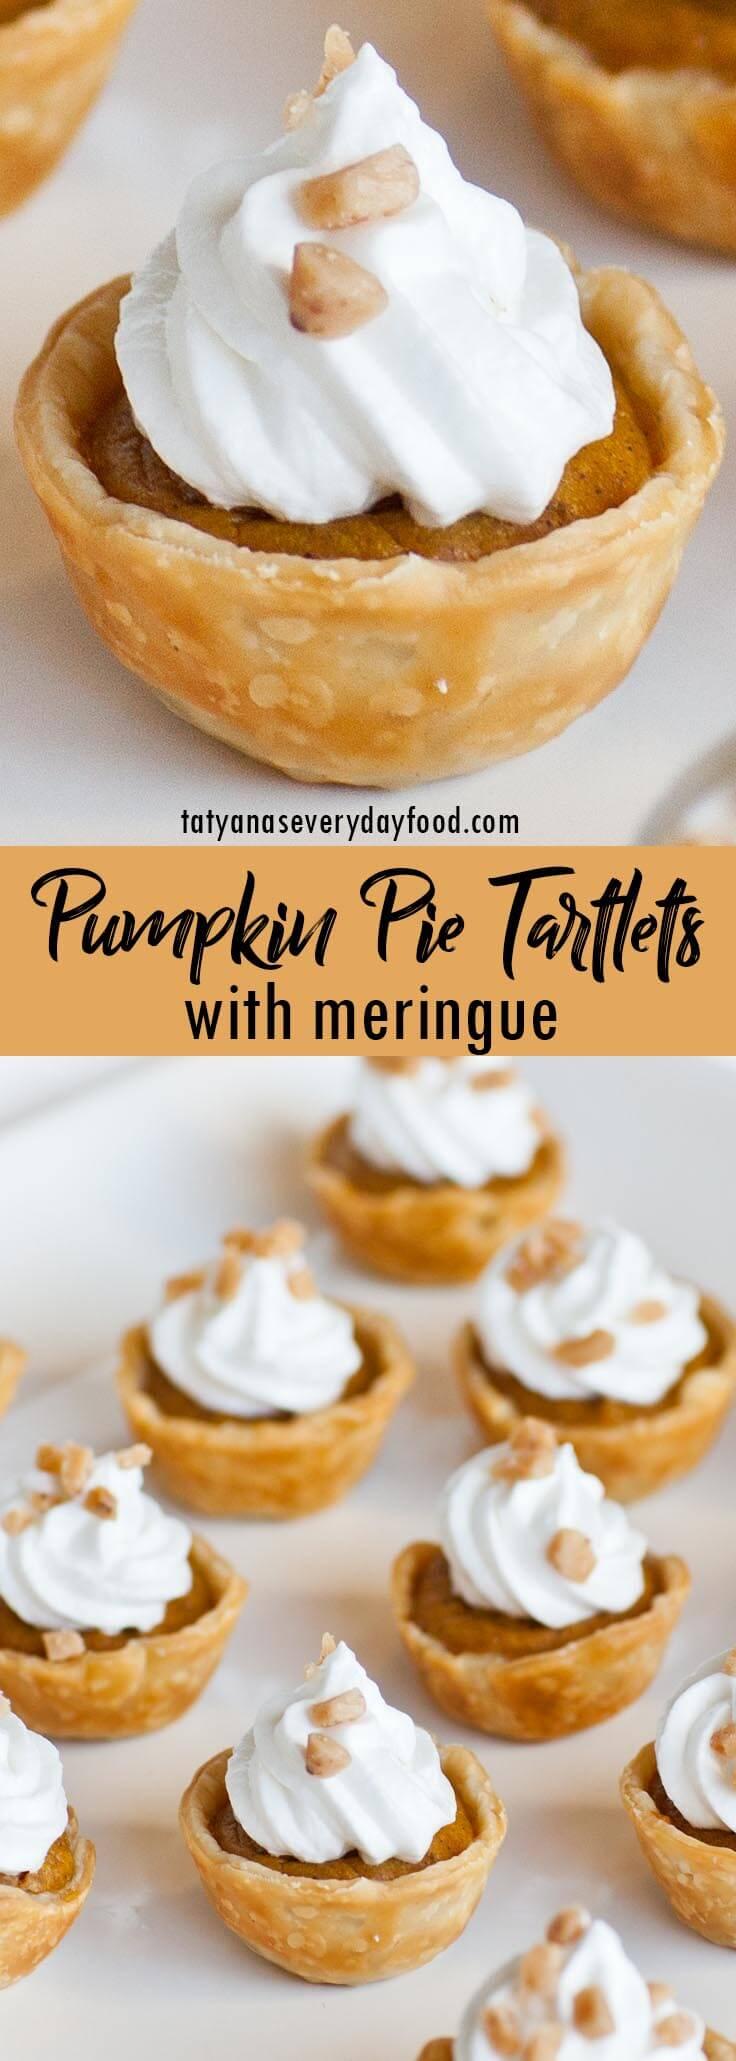 Pumpkin Pie Tartlets video recipe